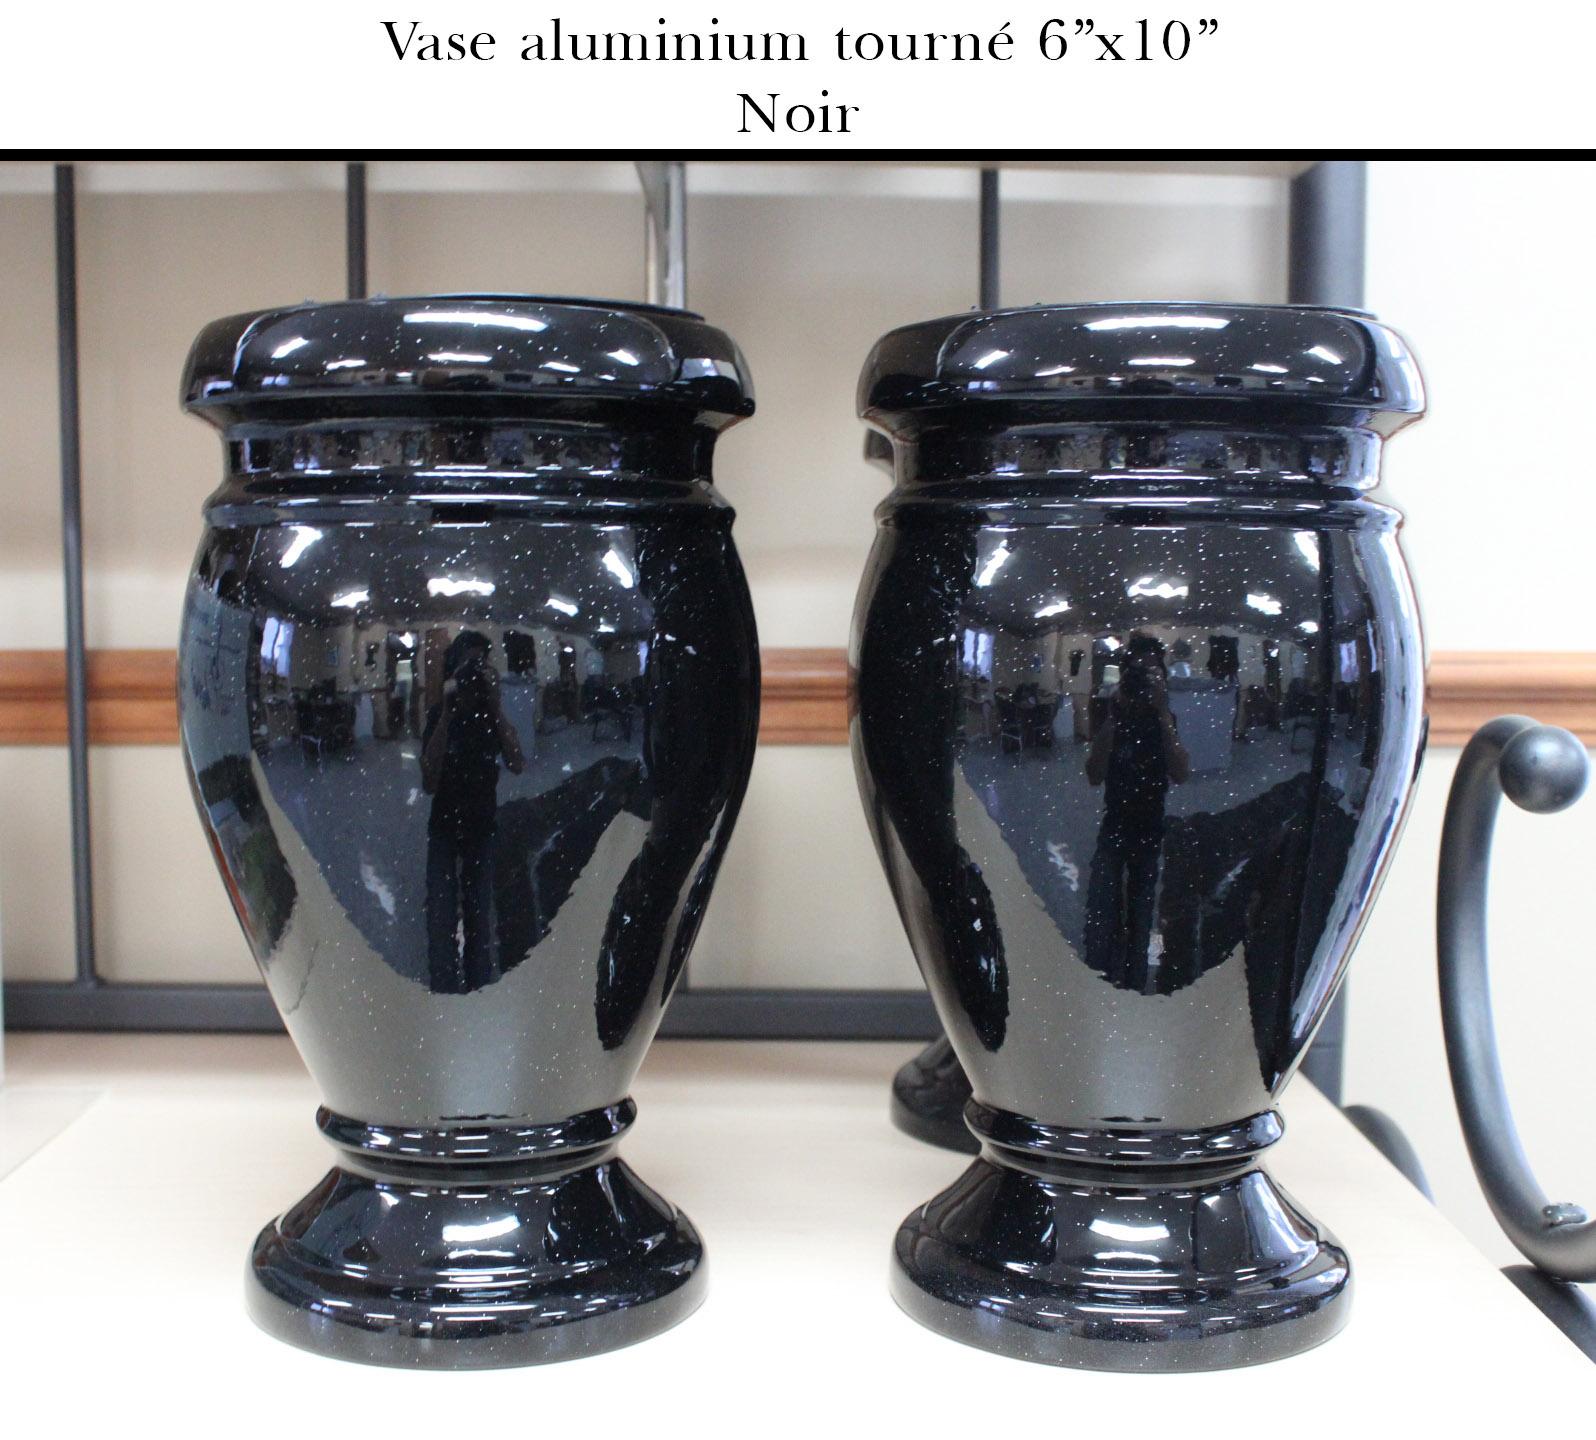 https://0901.nccdn.net/4_2/000/000/058/442/Vase-tourn---6-x10-noir-1596x1440.jpg